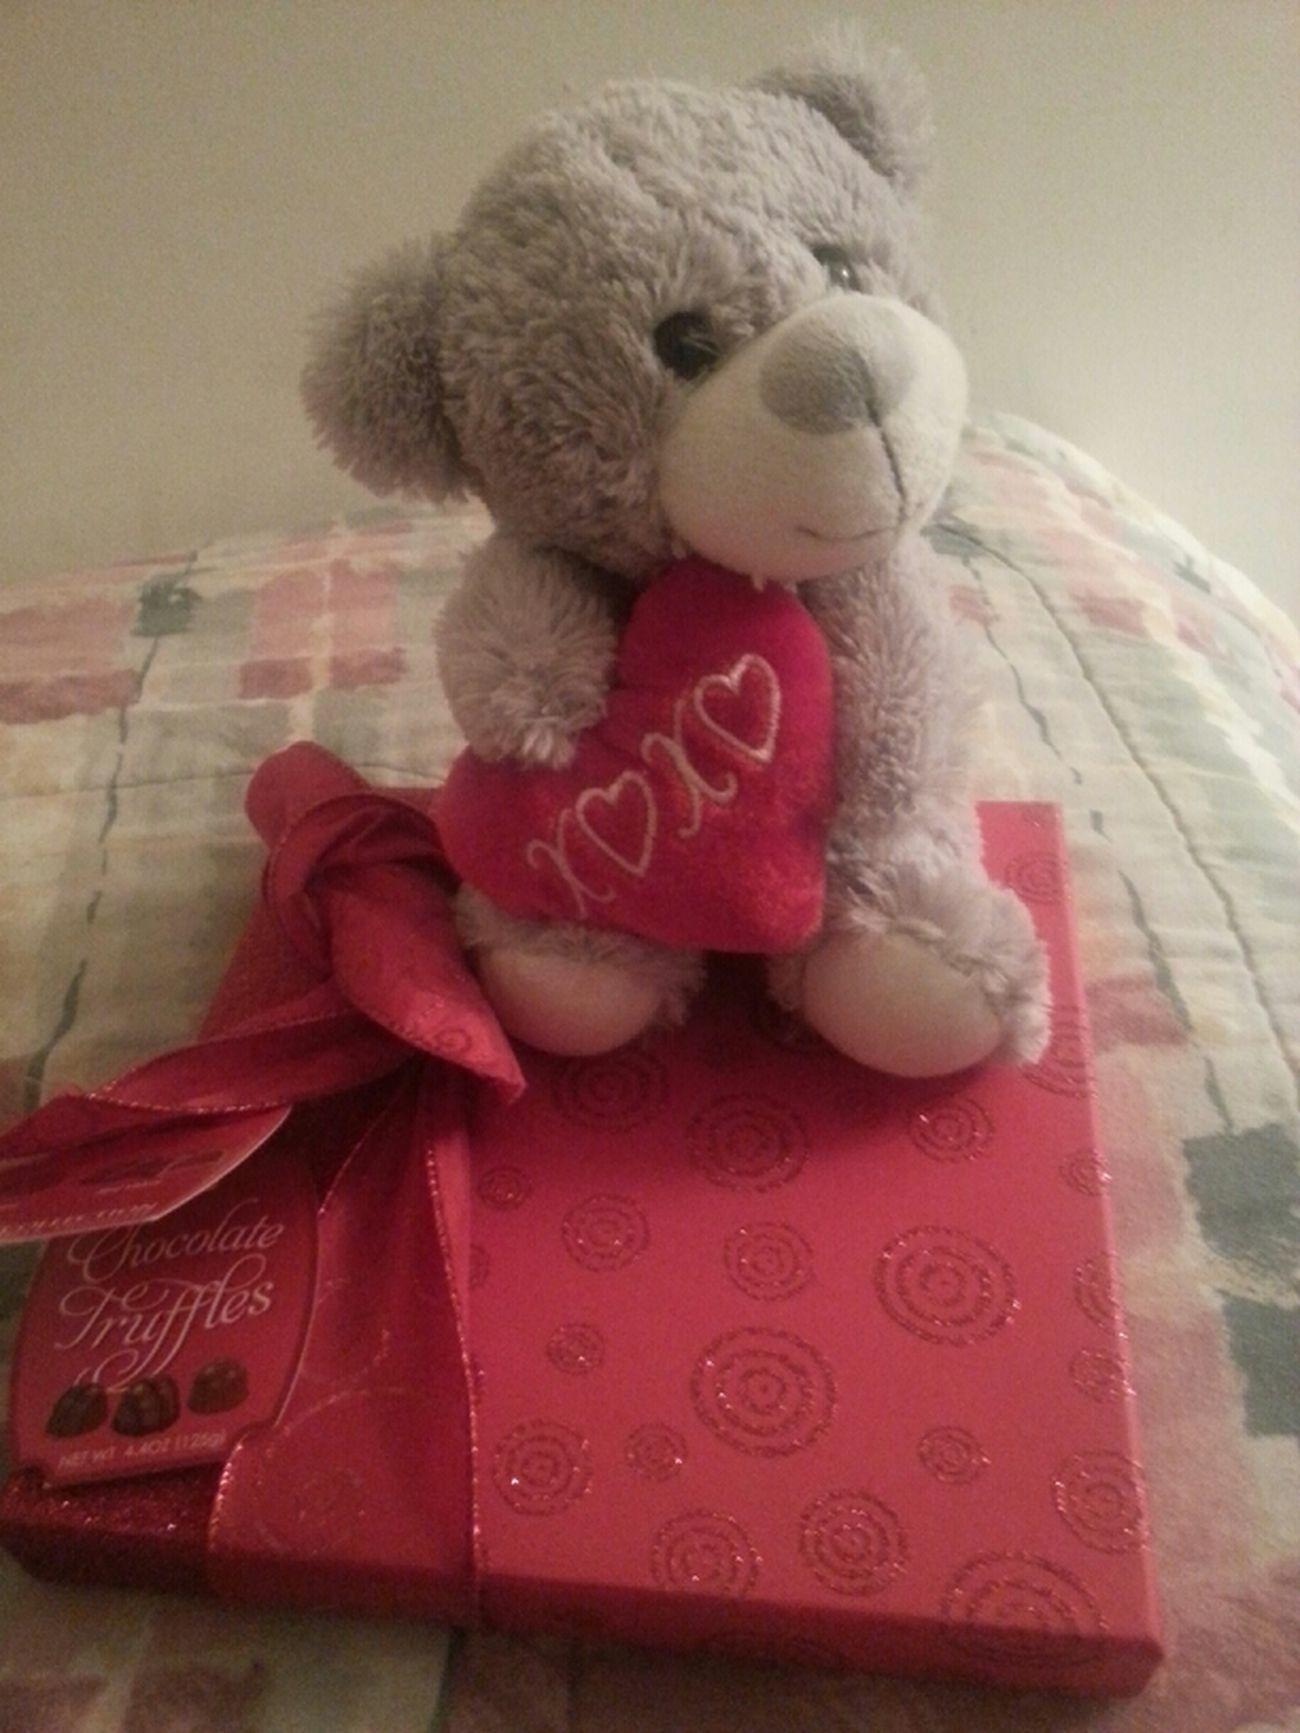 What My Boo Got Me Gor Valentine's Day <3